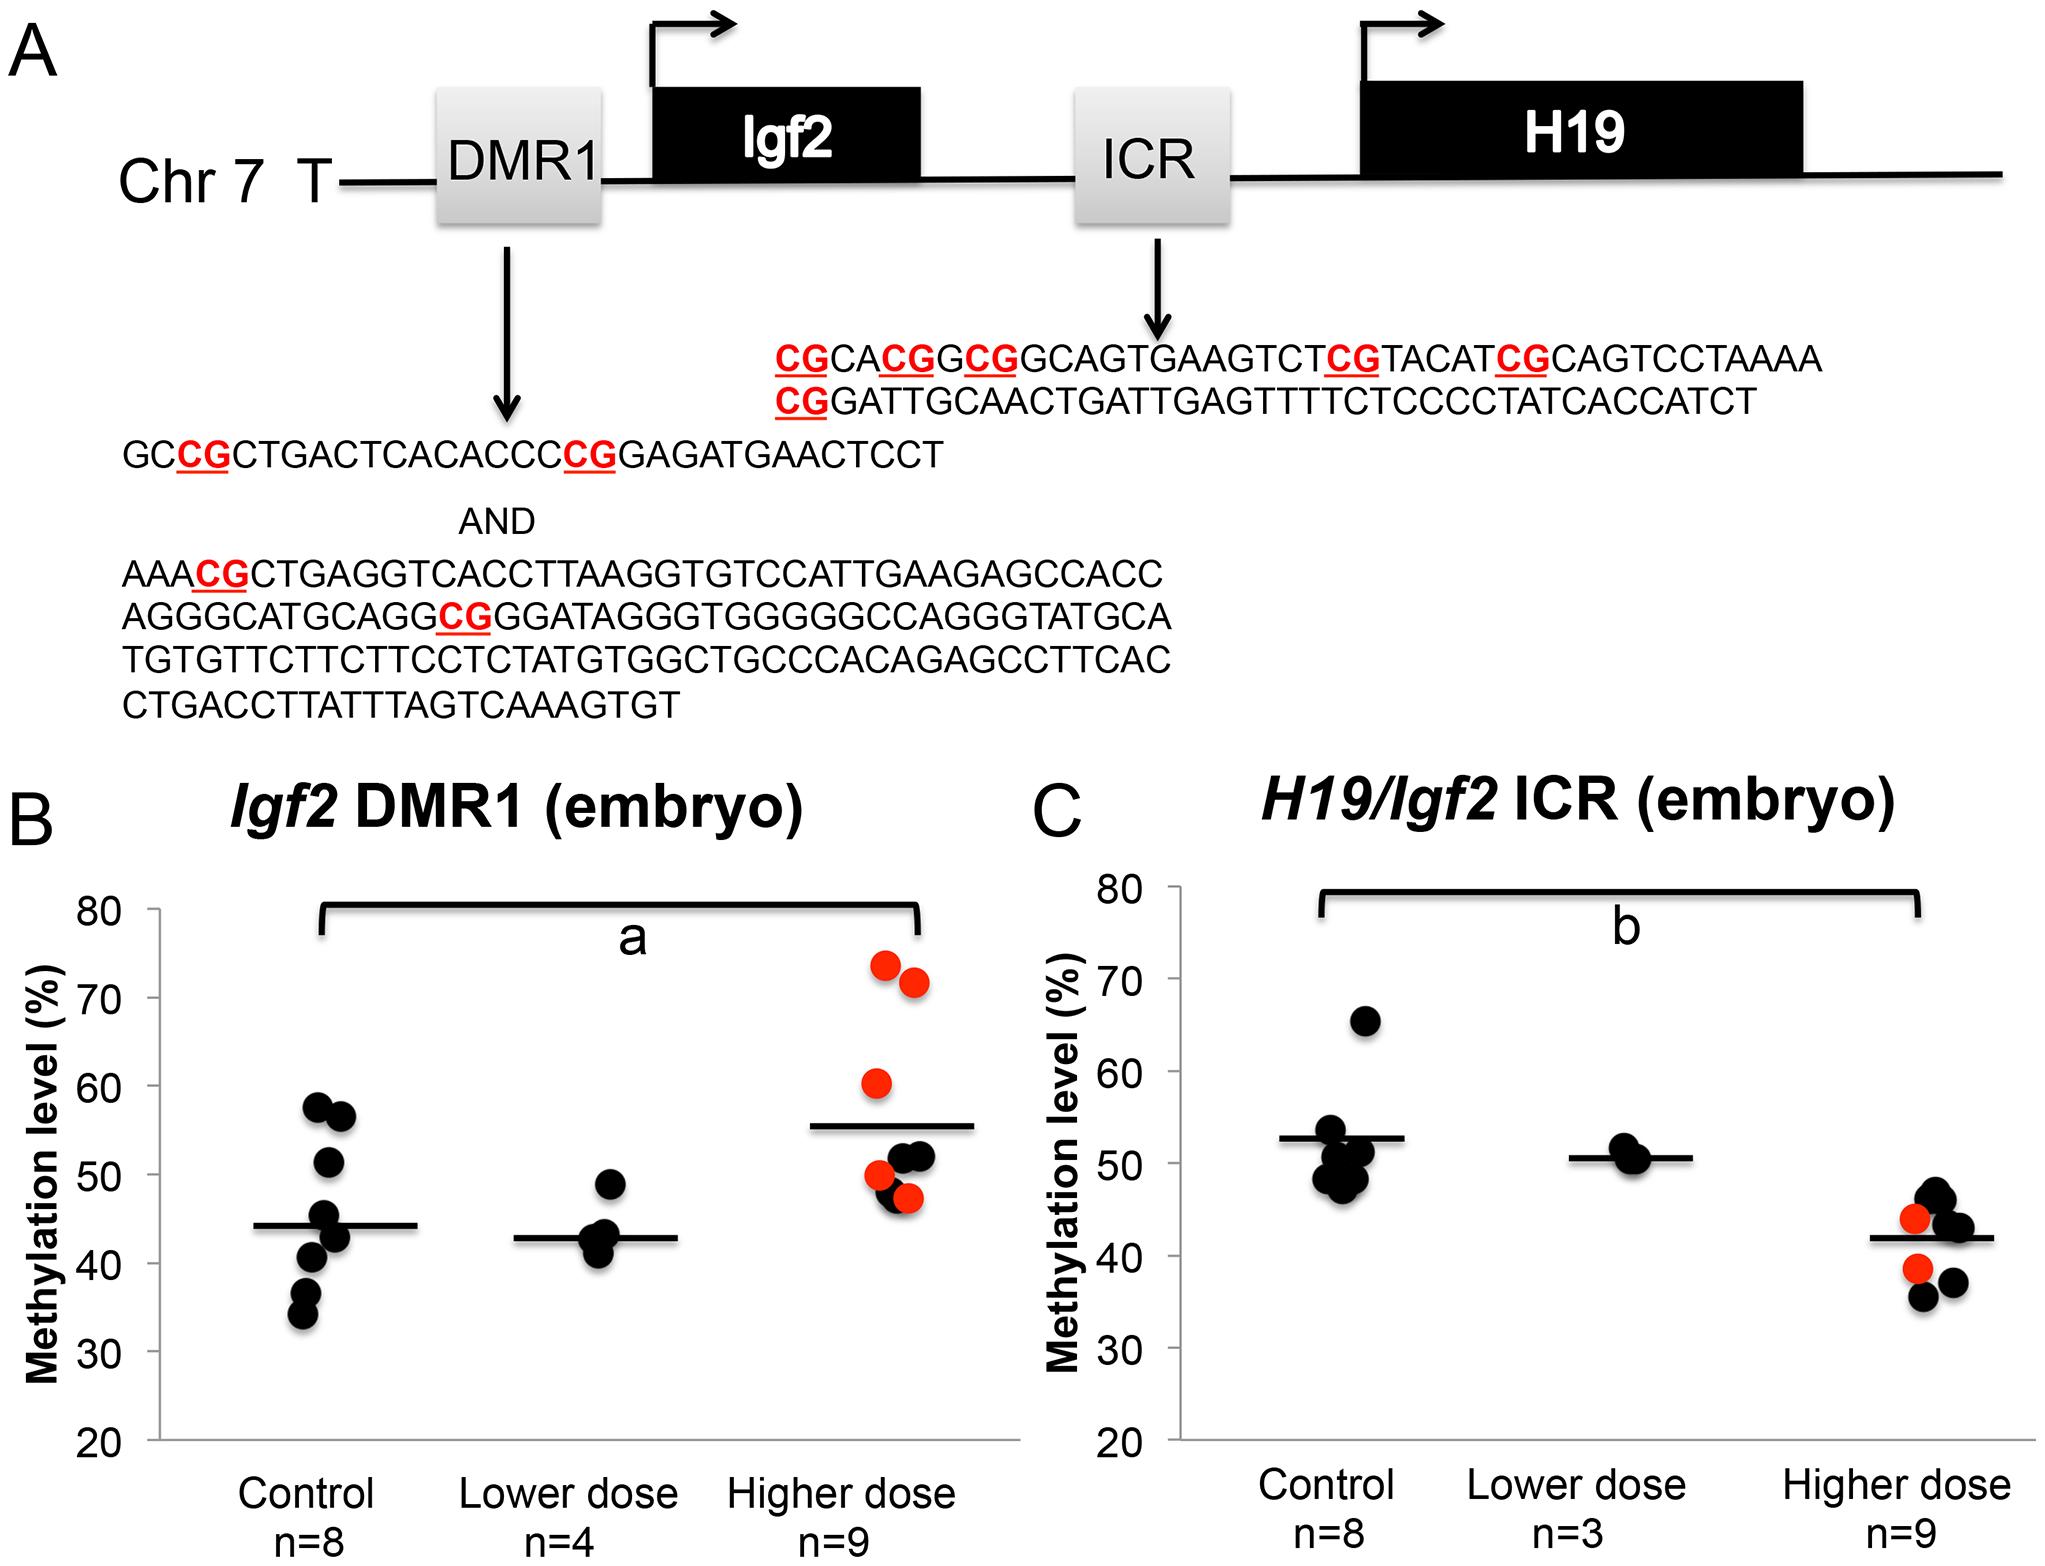 BPA exposure altered DNA methylation at the <i>Igf2</i> DMR1 and <i>H19/Igf2</i> ICR in the embryos.